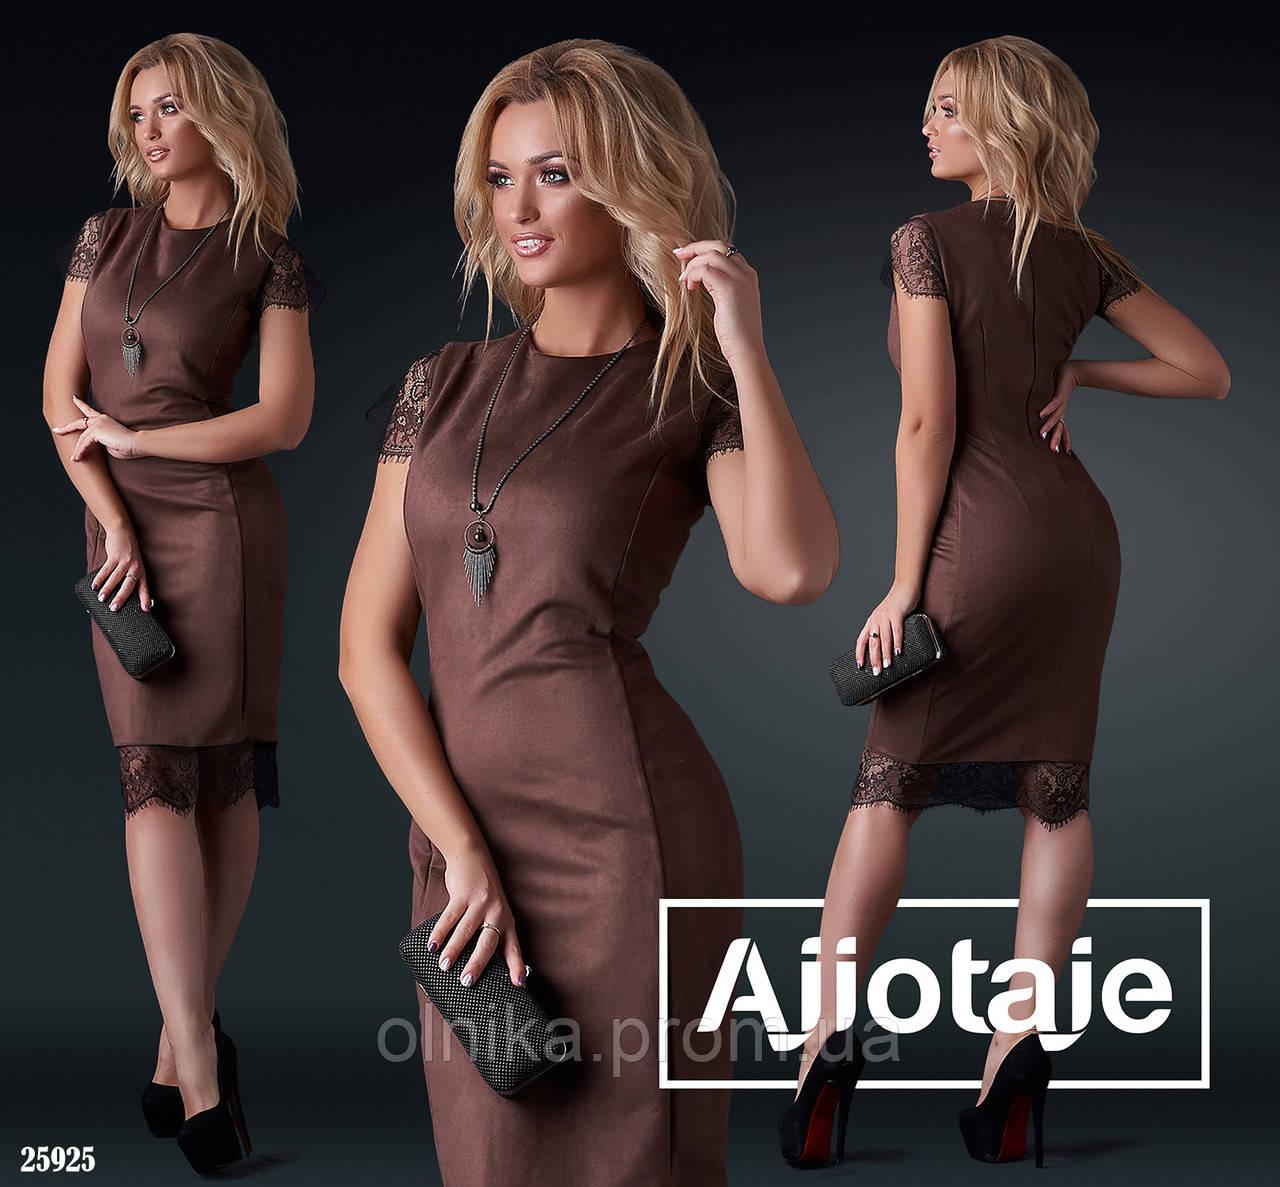 Платье - 25925.Размер:S M L